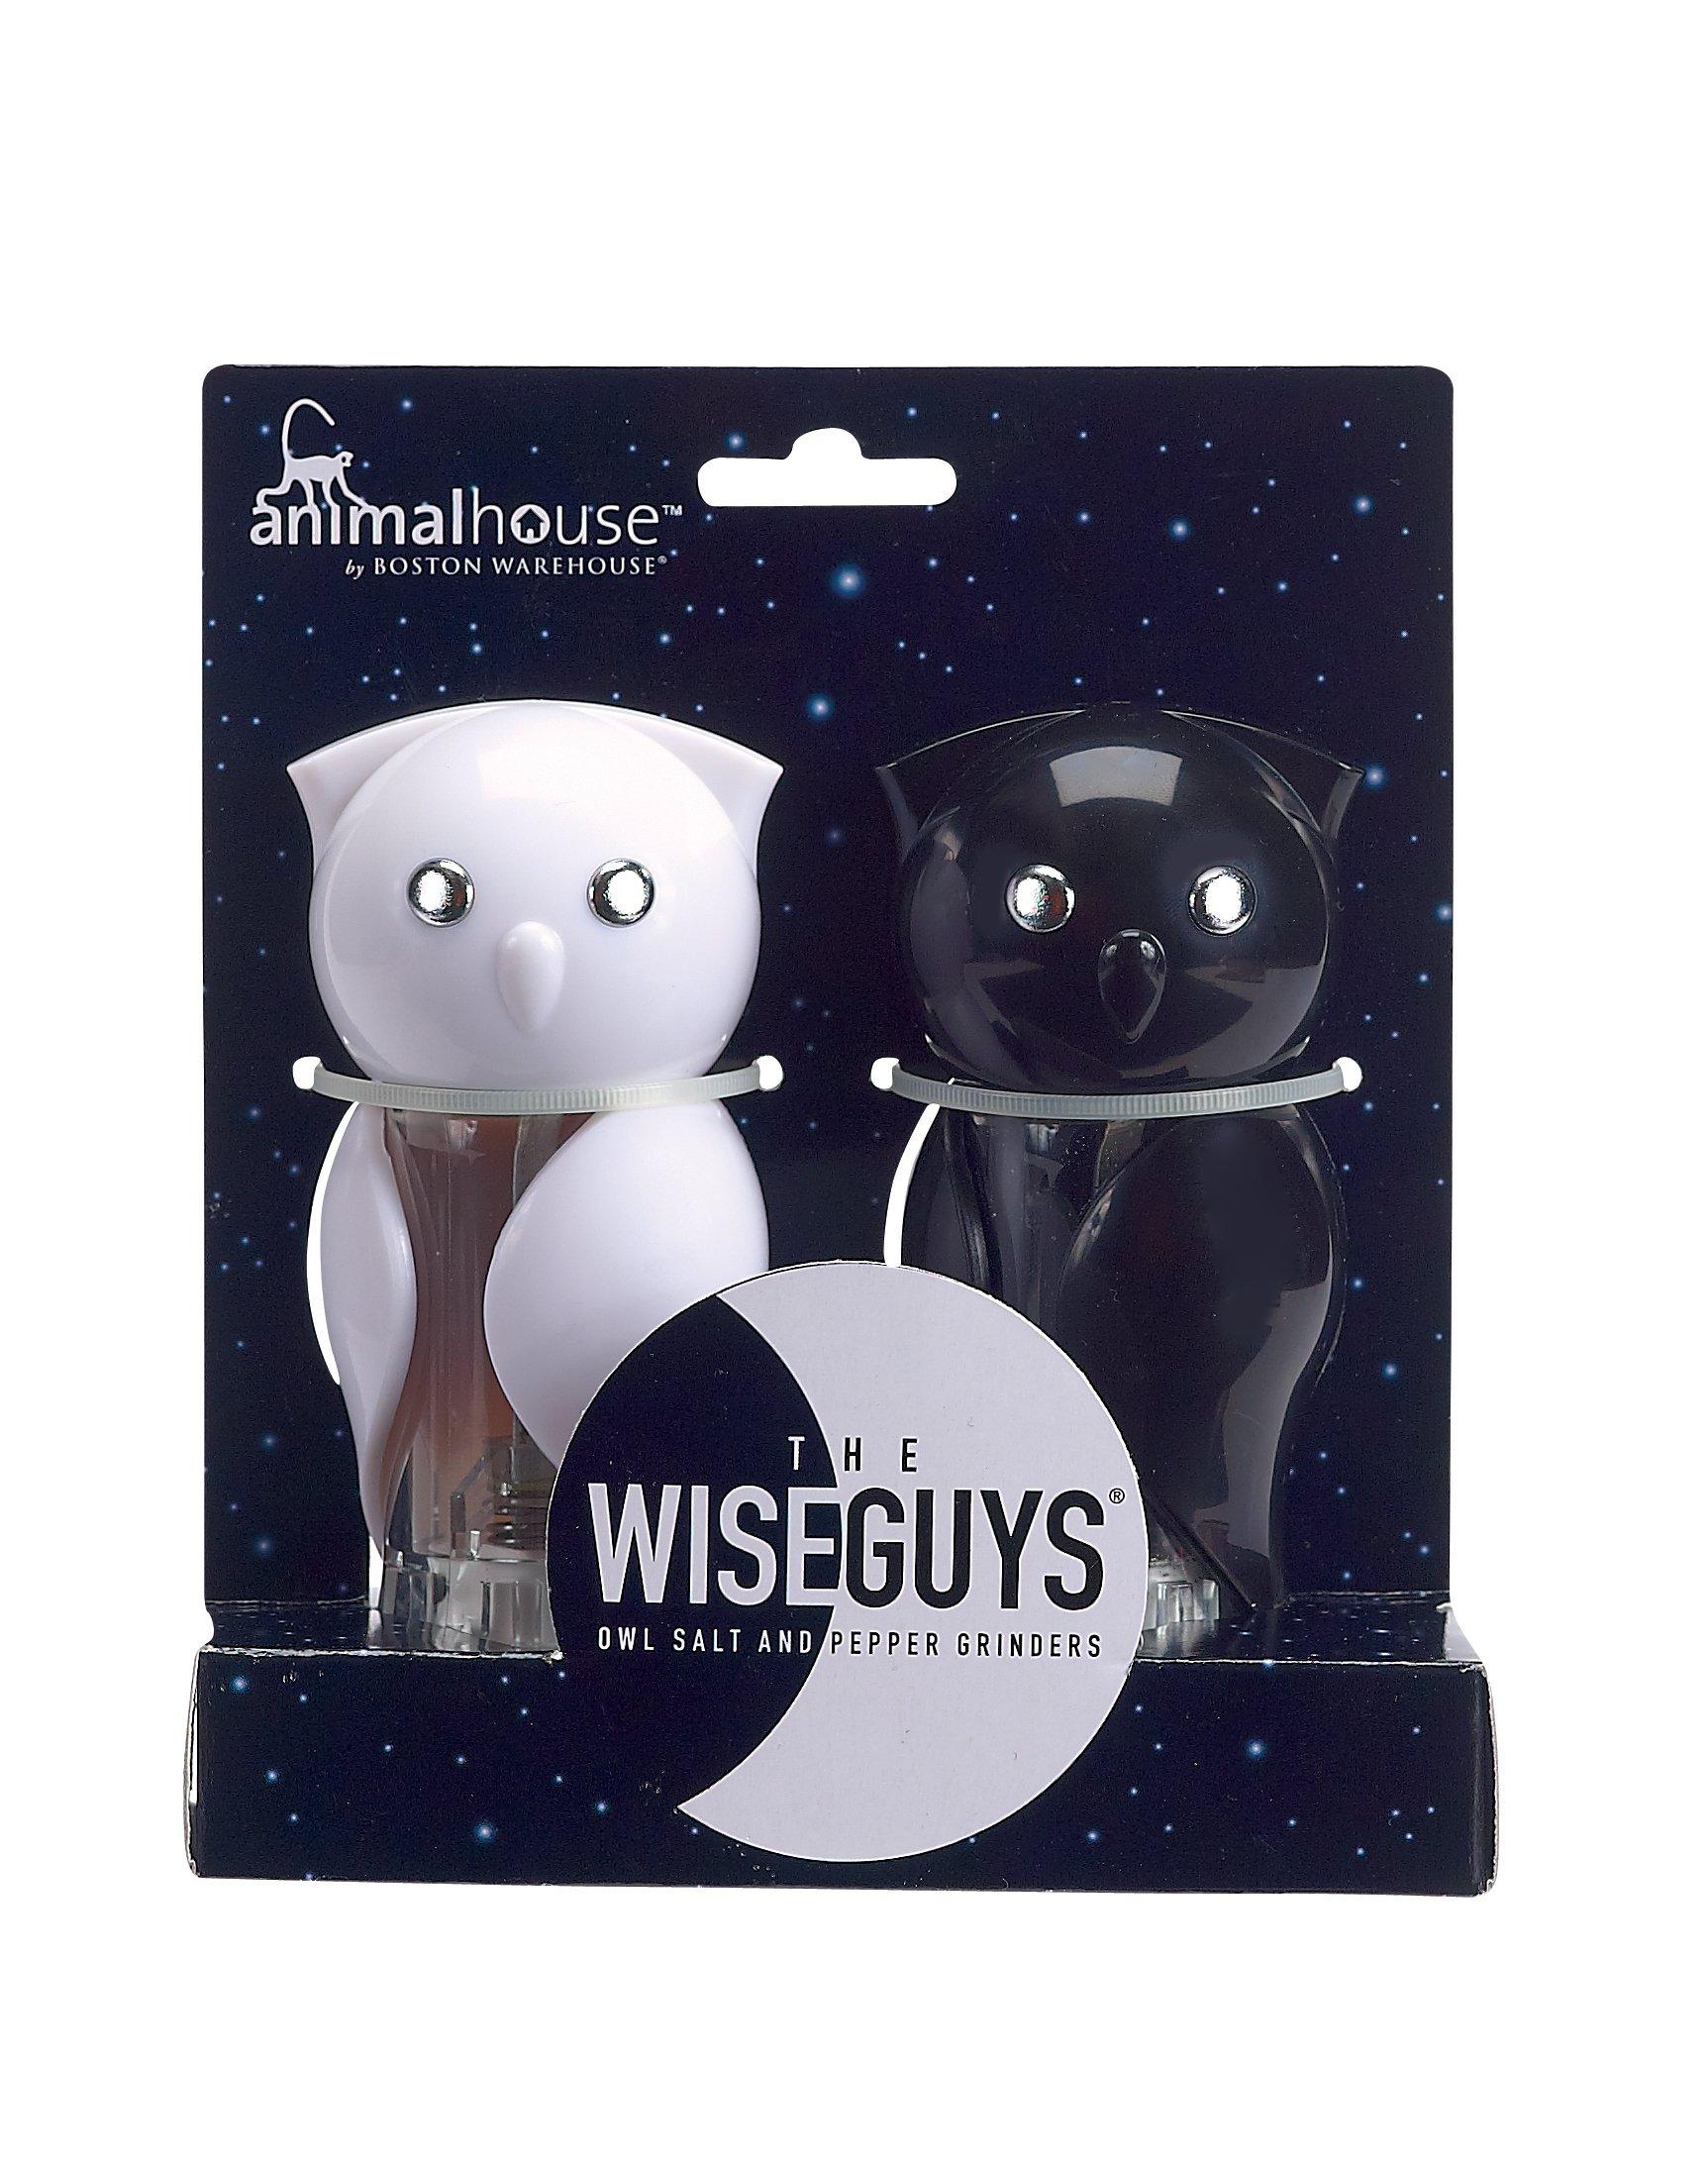 Boston Warehouse Animal House Wise Guys Salt and Pepper Grinder Set